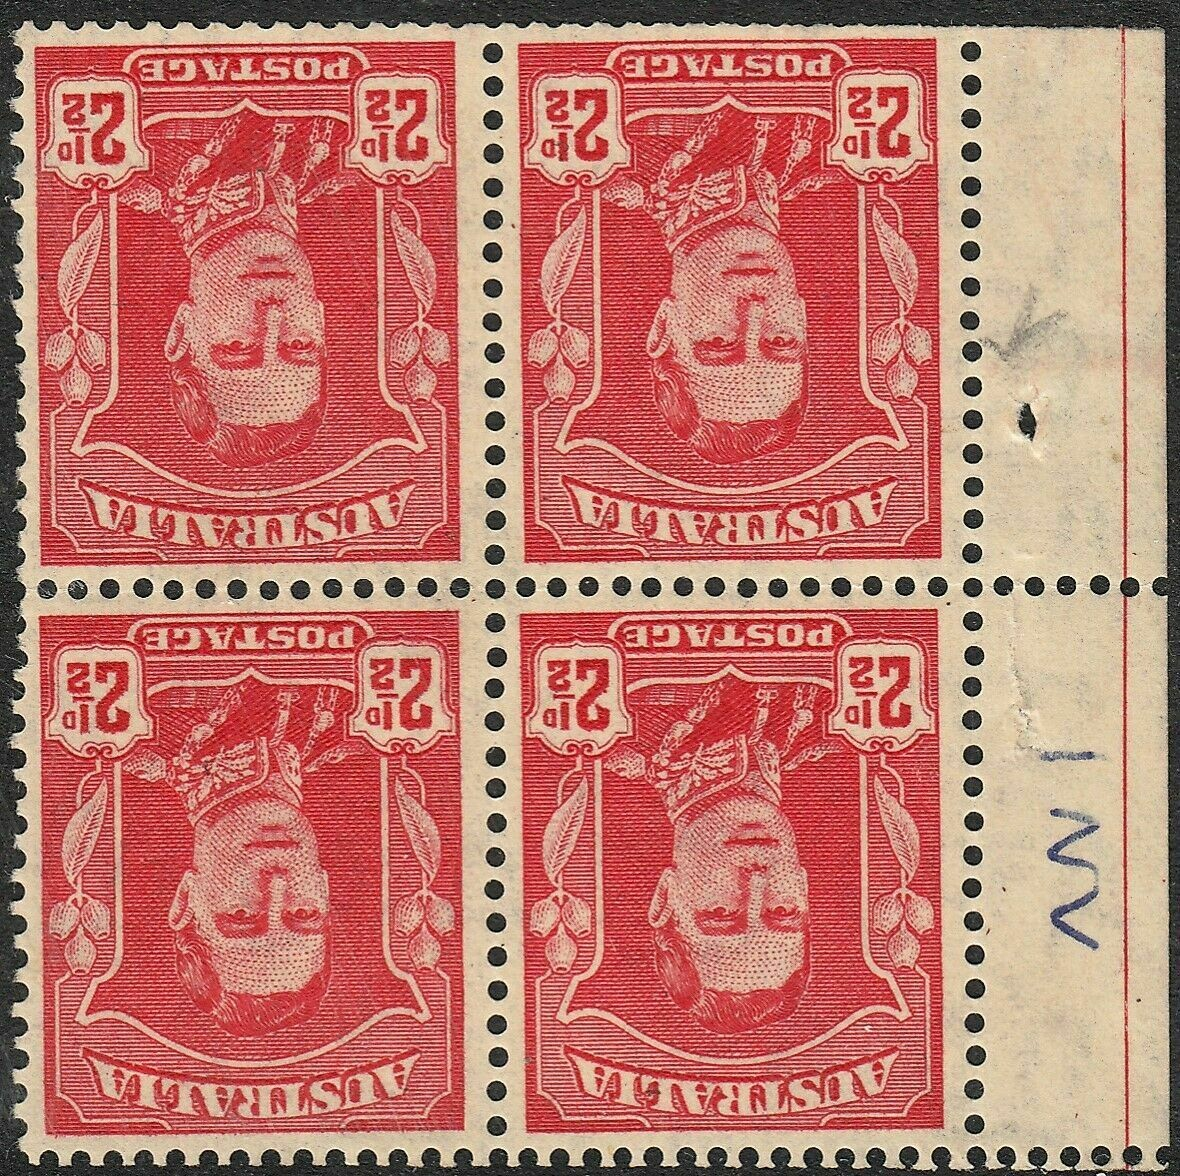 Australia 1942 KGVI 2½d Red Inverted Watermark (Booklet) Block of 4 MUH/MH